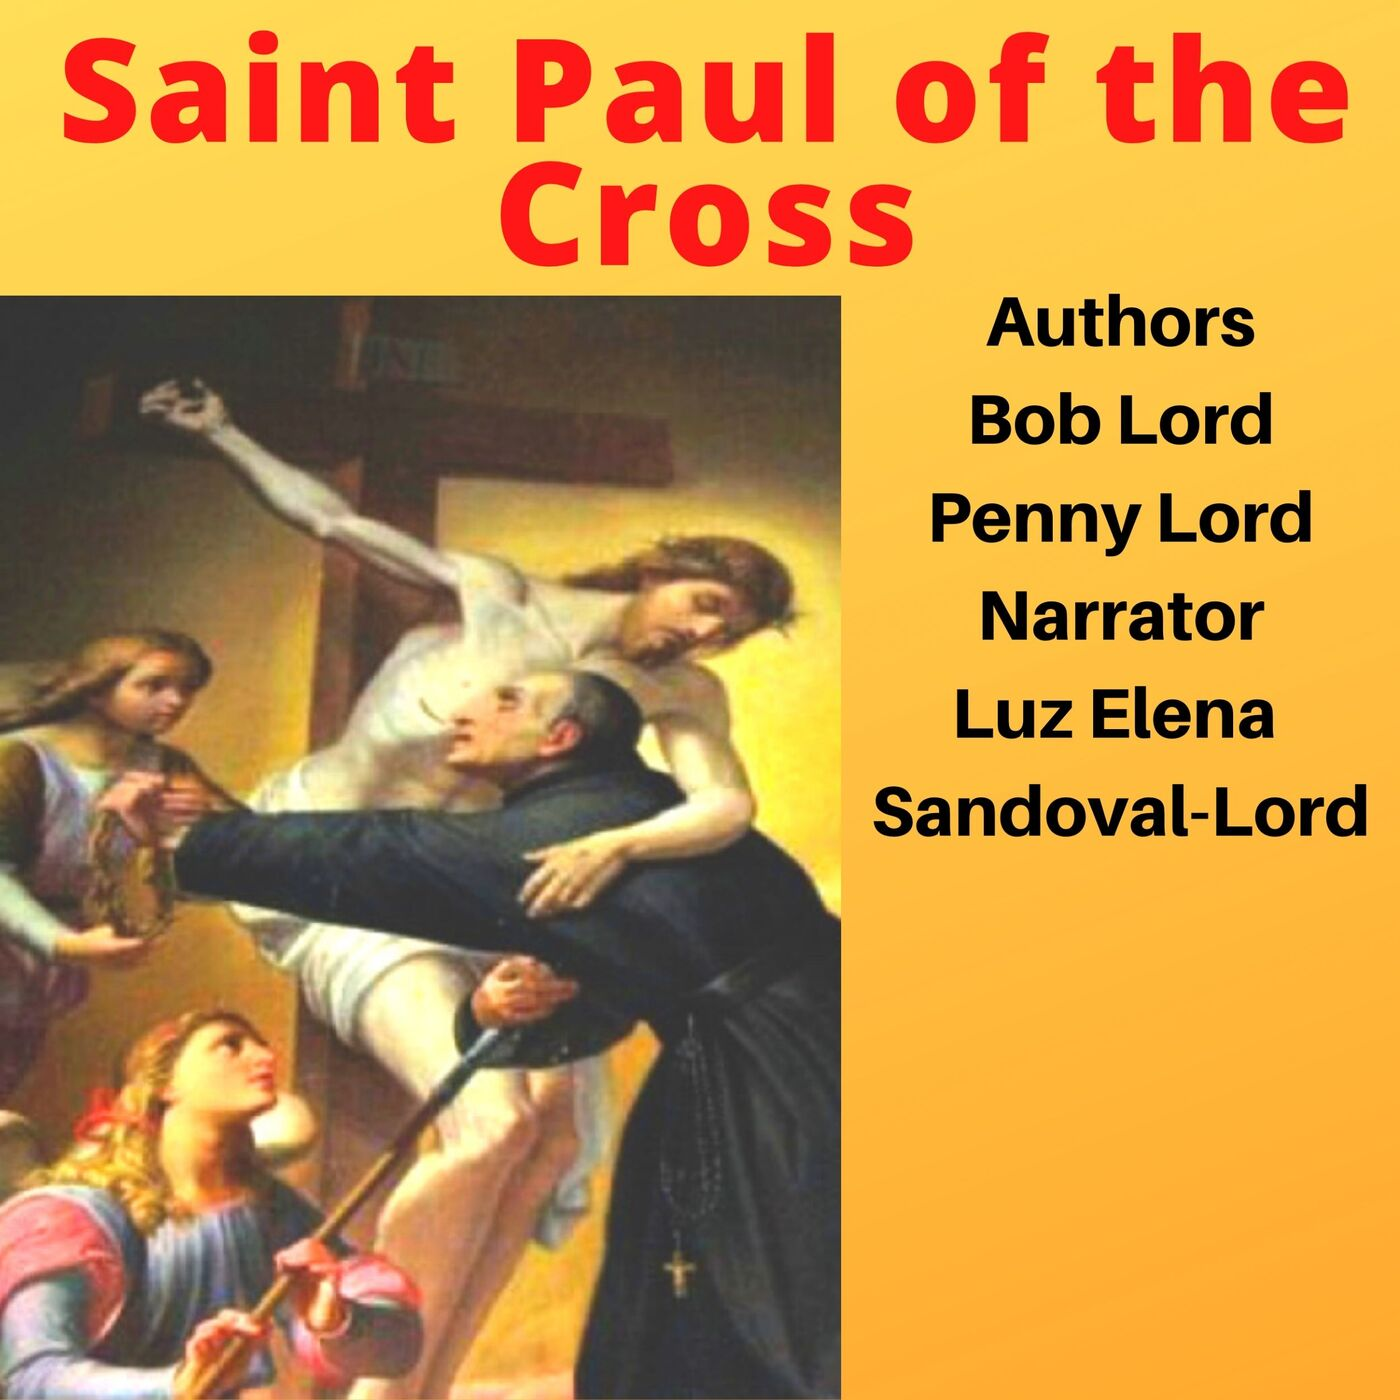 Saint Paul of the Cross Feast Day October 20